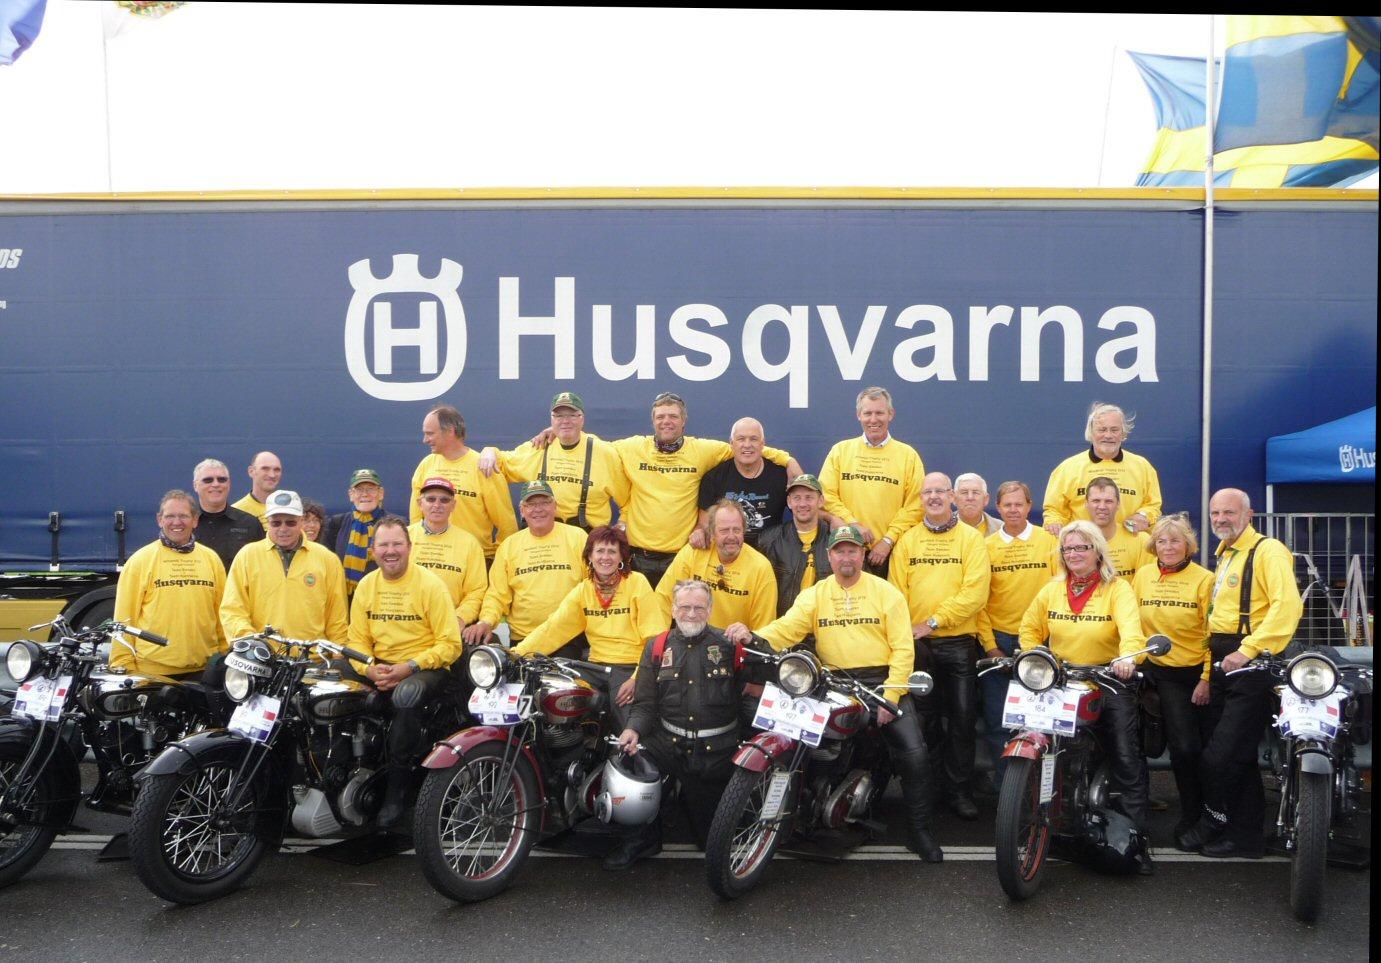 Husqvarna Motorcycle Club